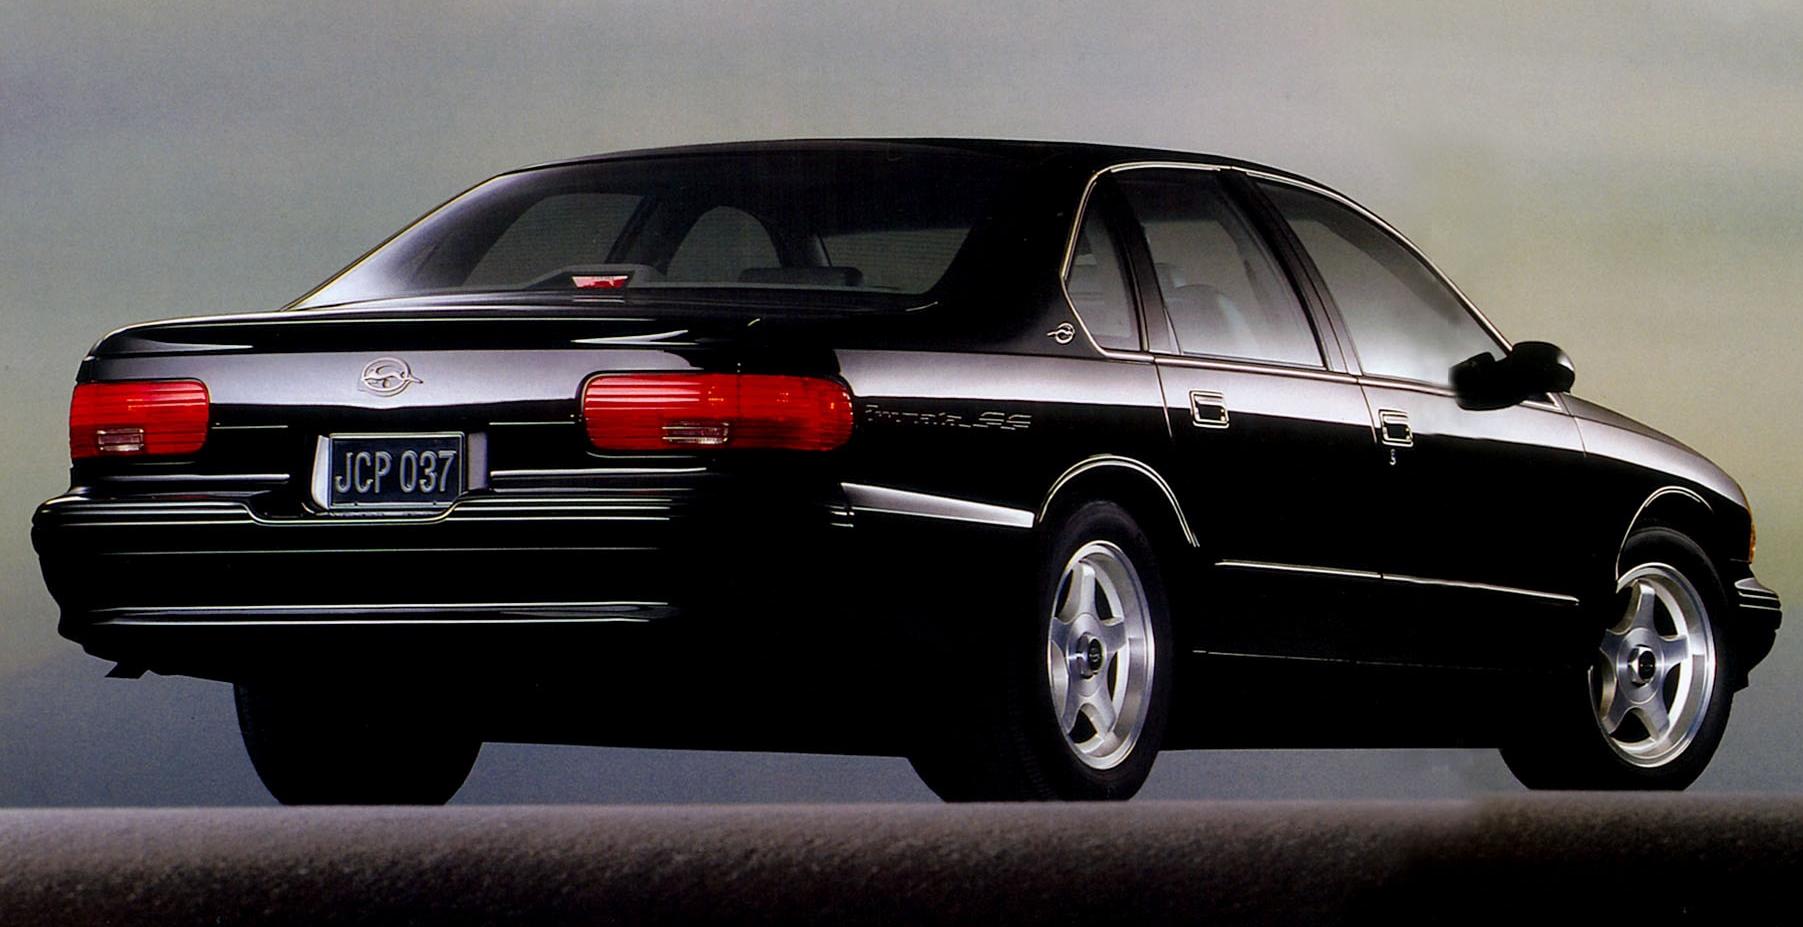 Impala - 4 Door Muscle Cars